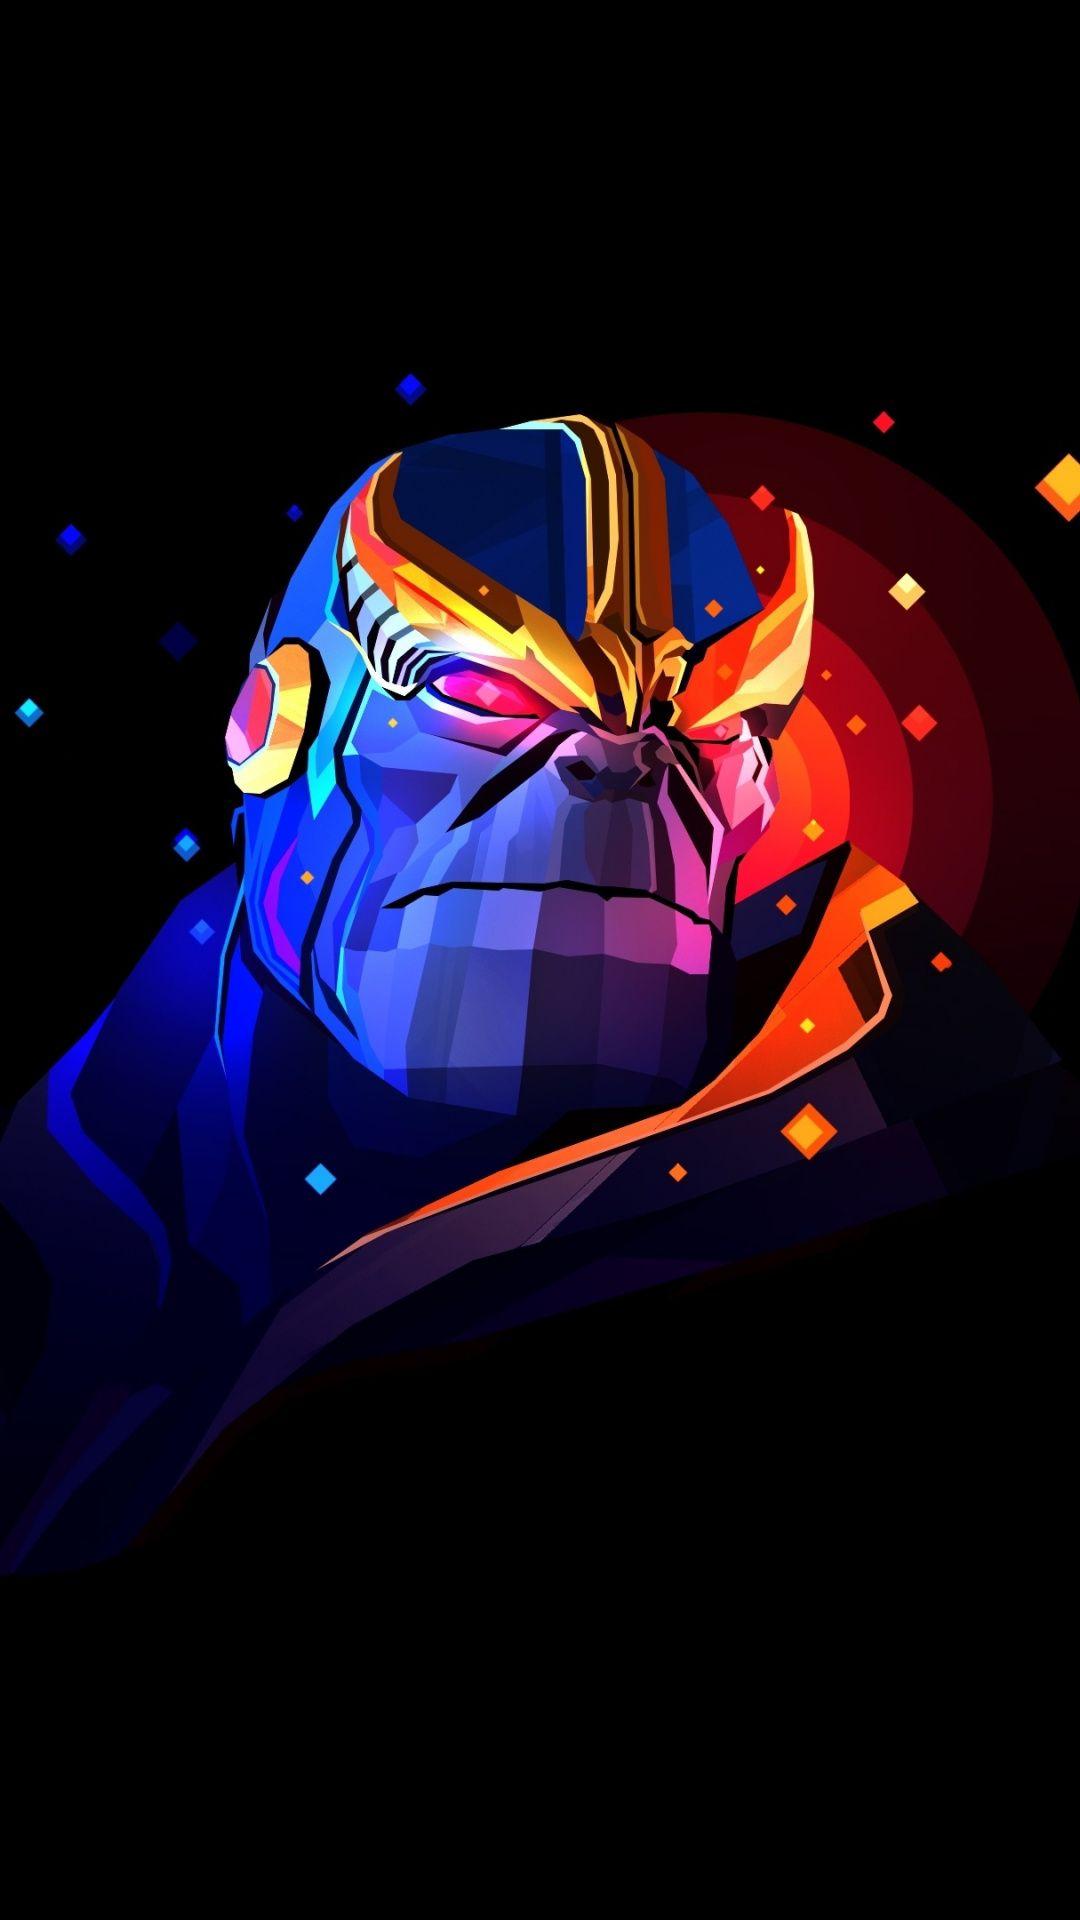 Avengers Infinity War Thanos Minimal Art Wallpaper Marvel